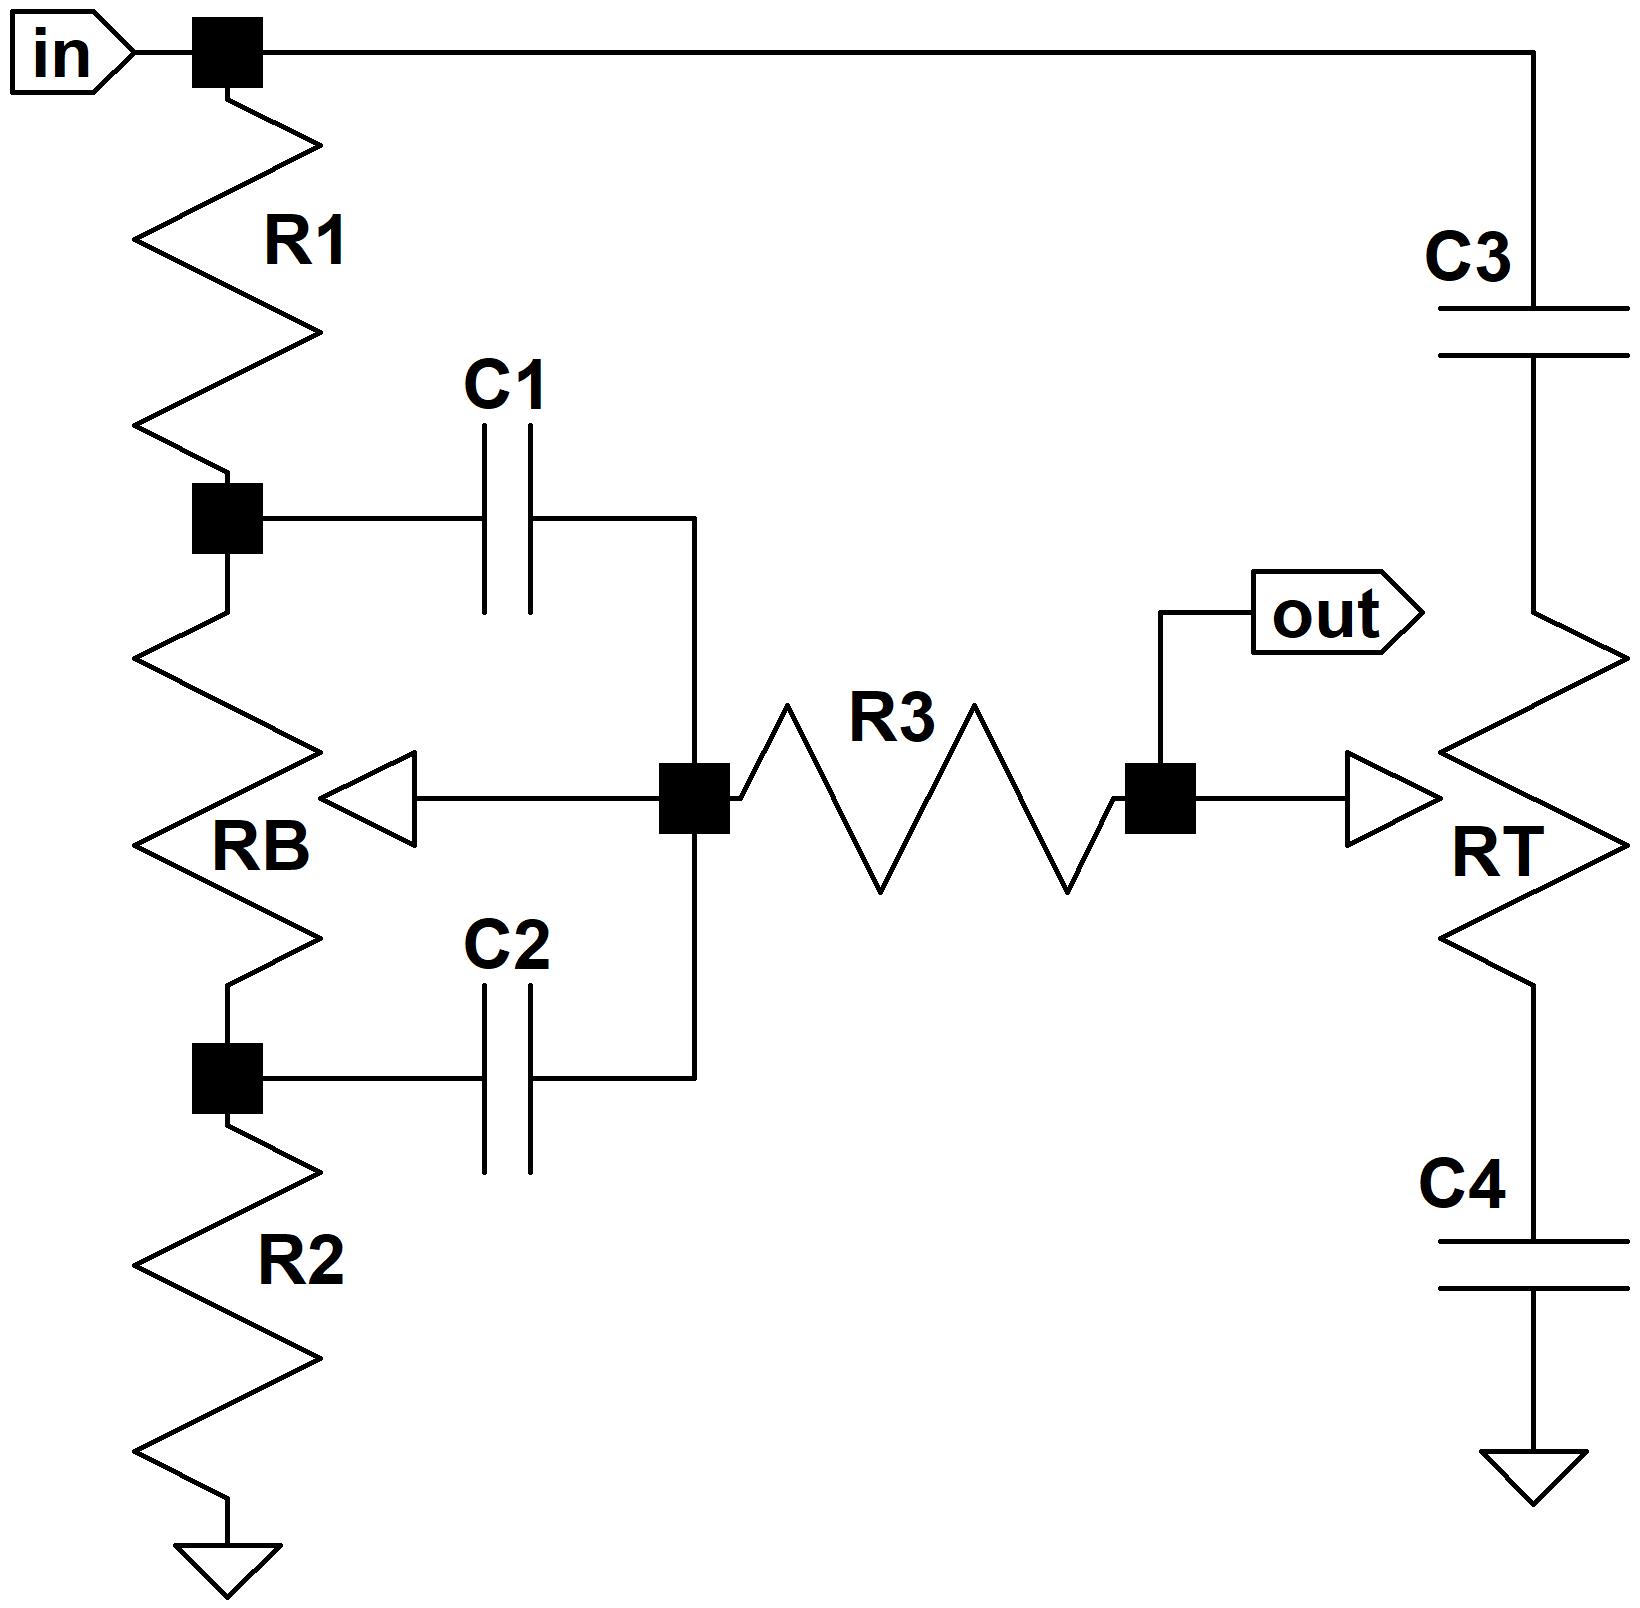 Phenomenal James Tone Stack Analysis Wiring Database Mangnorabwedabyuccorg